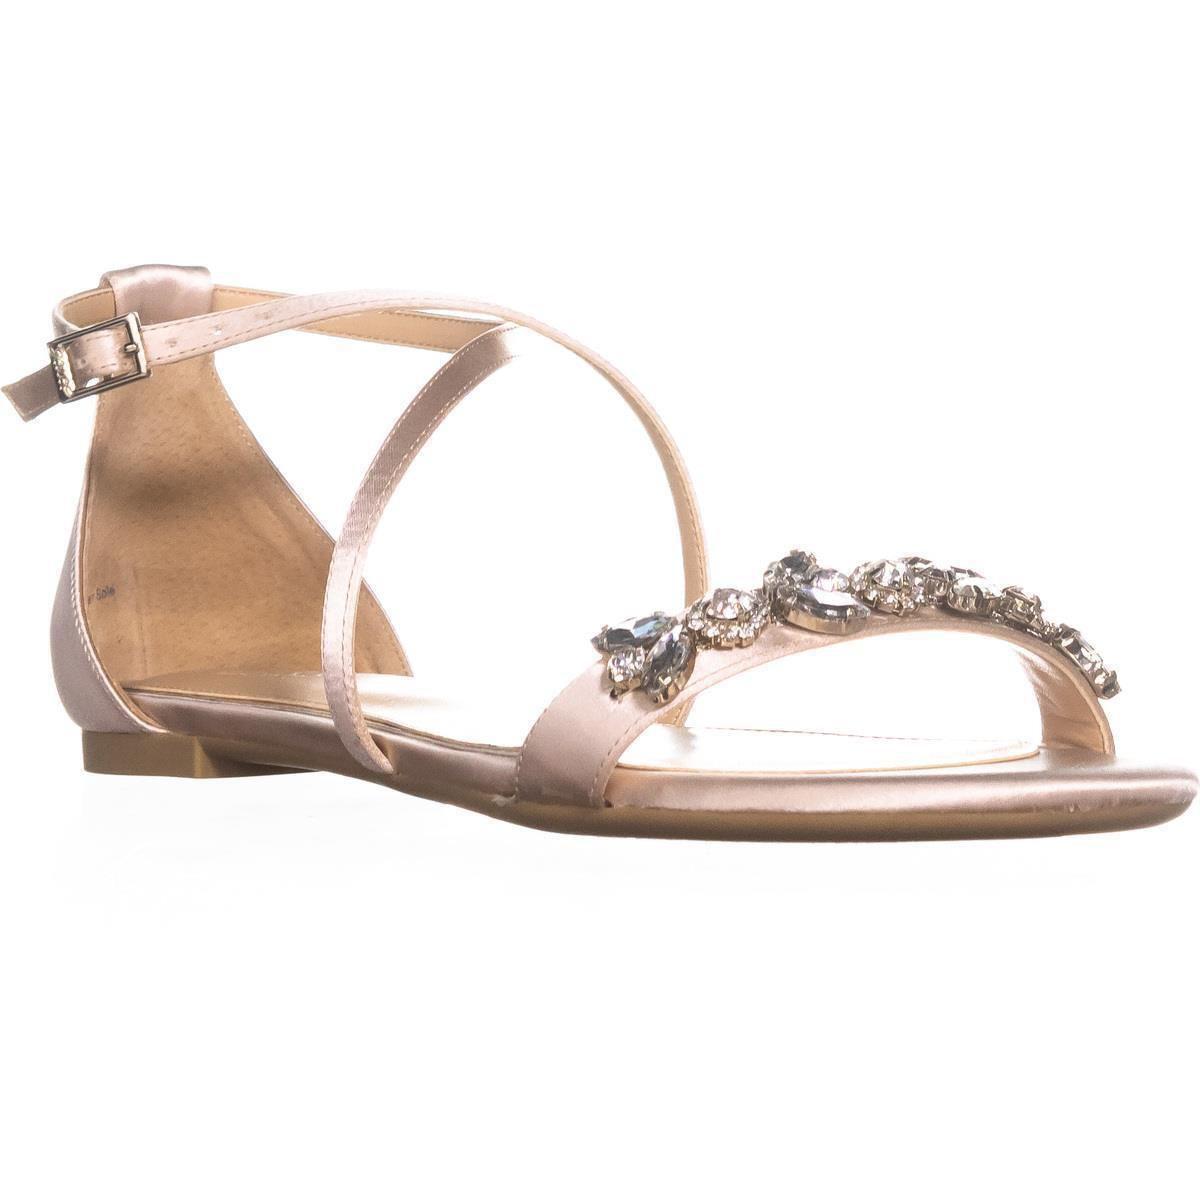 673d93086 Badgley Mischka. Women s Jewel By Tessy Rhinestone Sandals ...